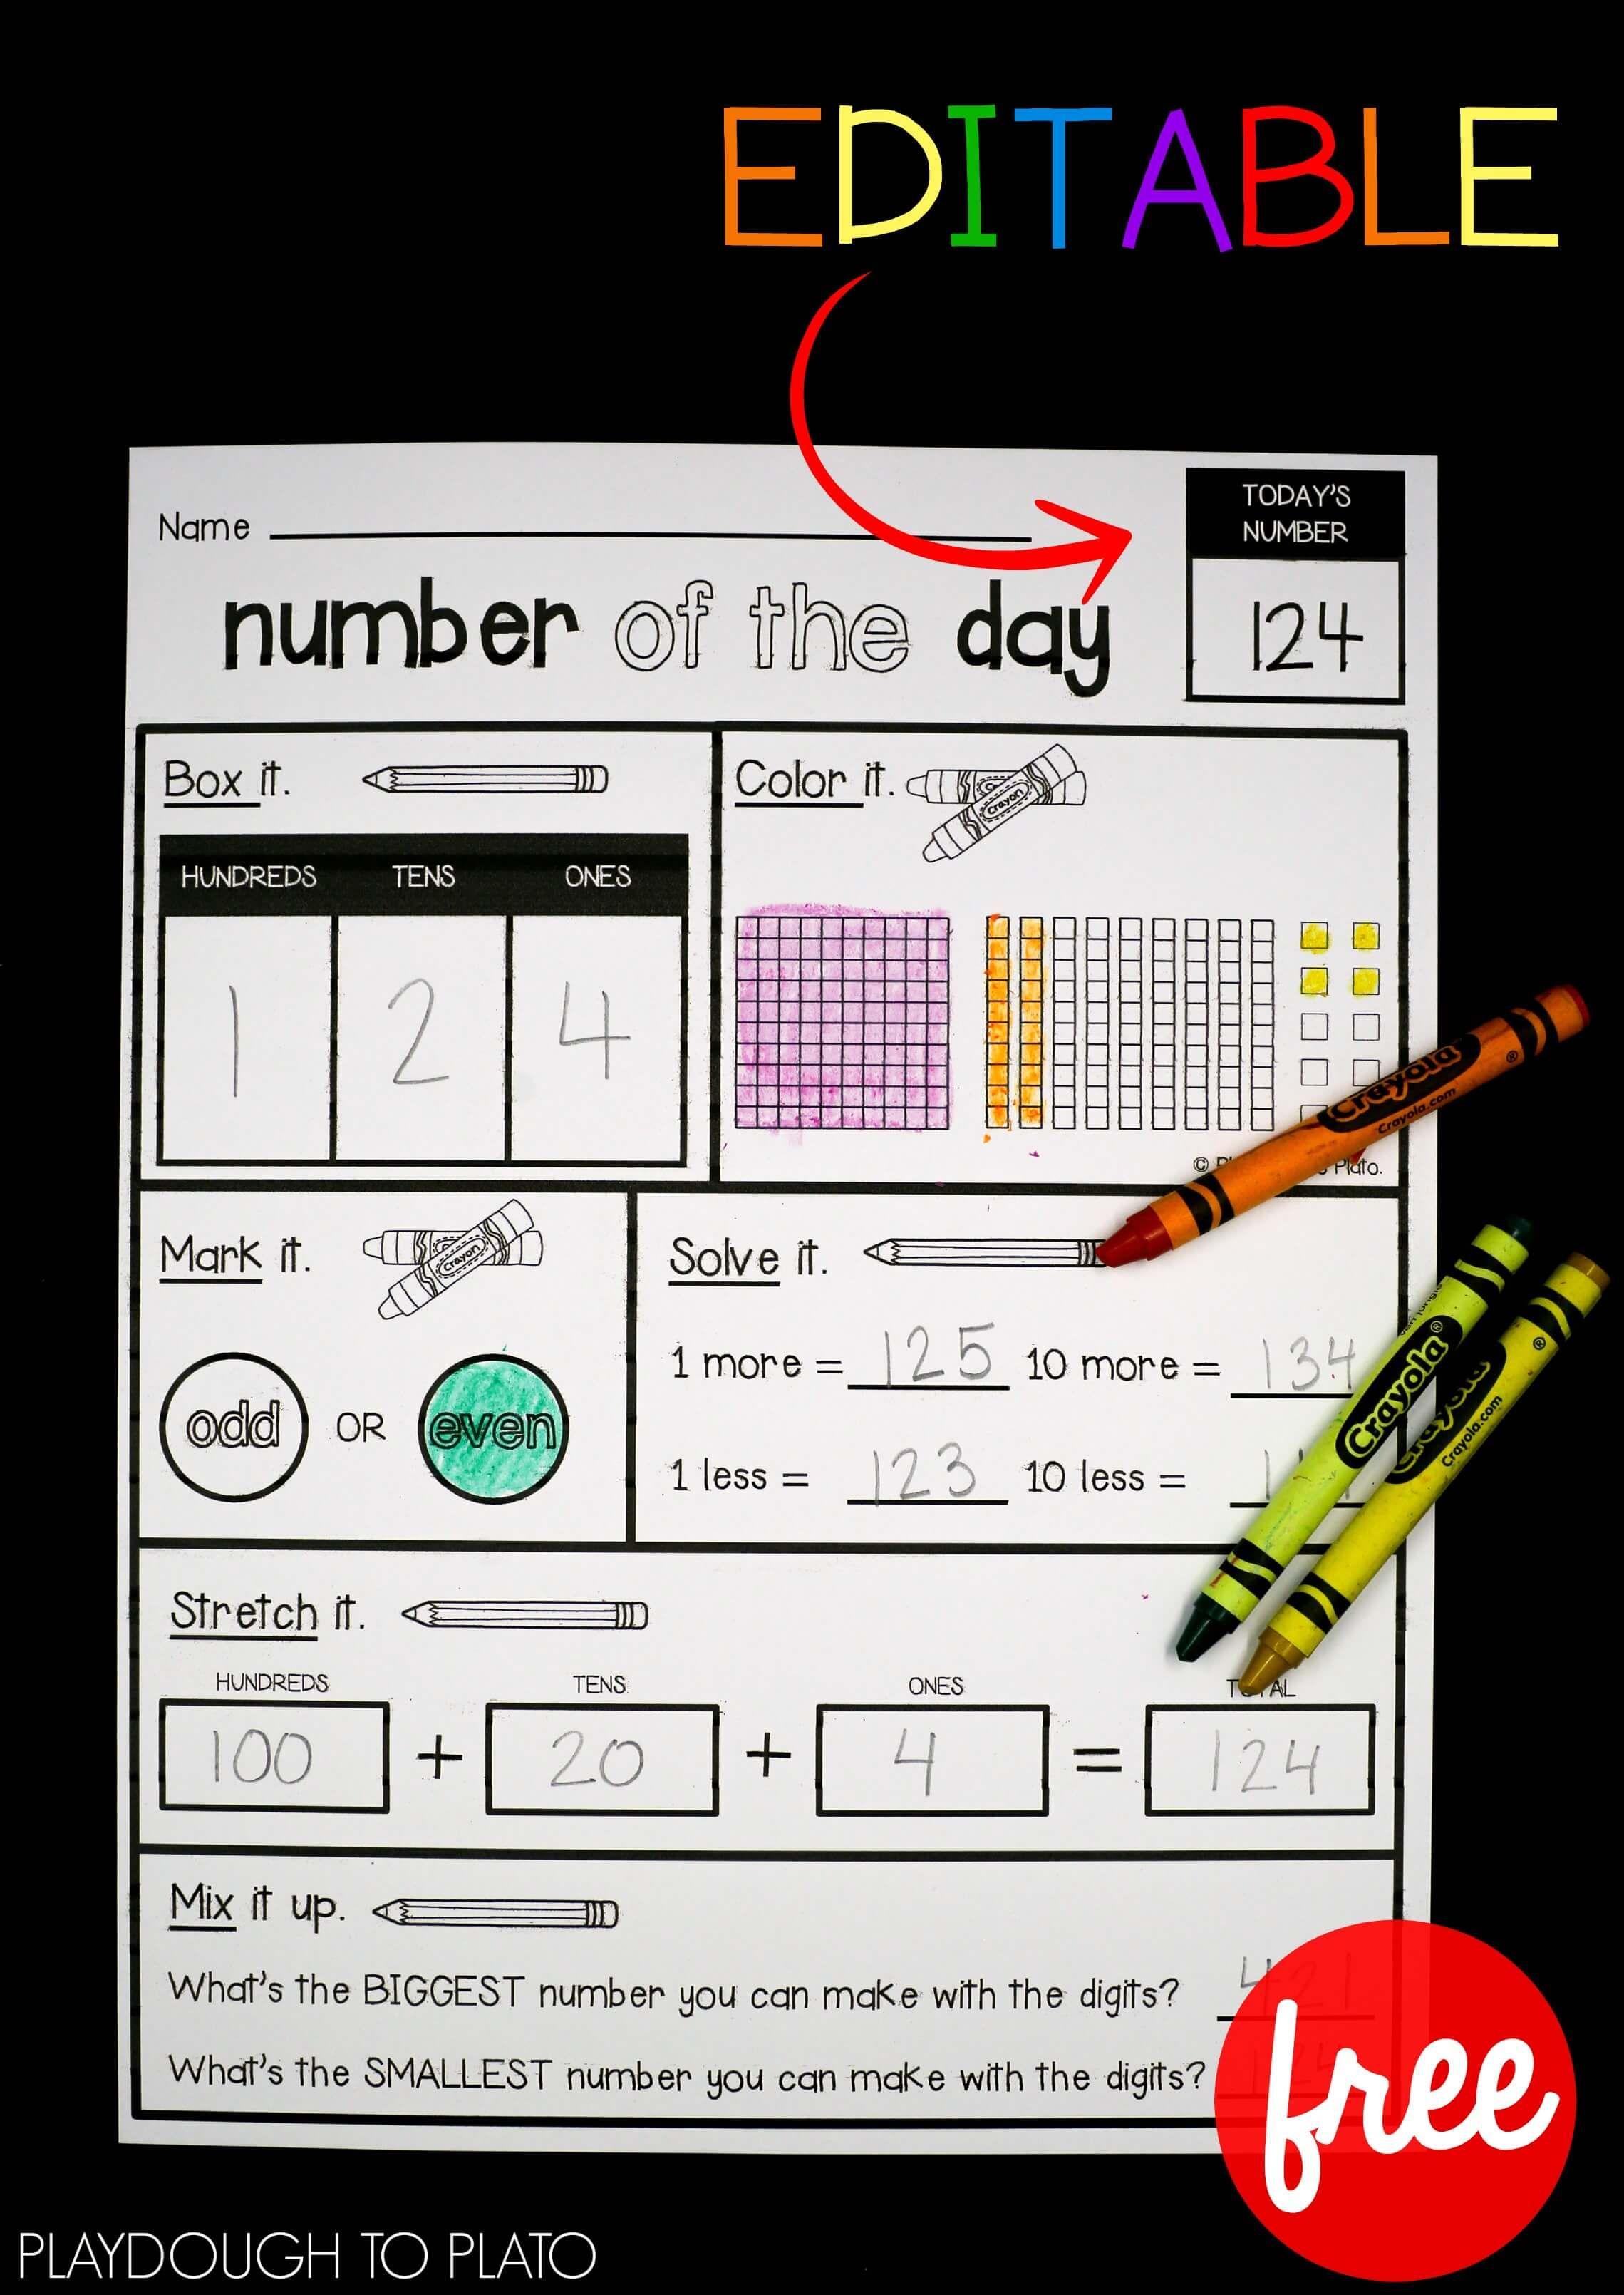 Editable Number Of The Day Sheet Playdough To Plato 3rd Grade Math 1st Grade Math Math Centers